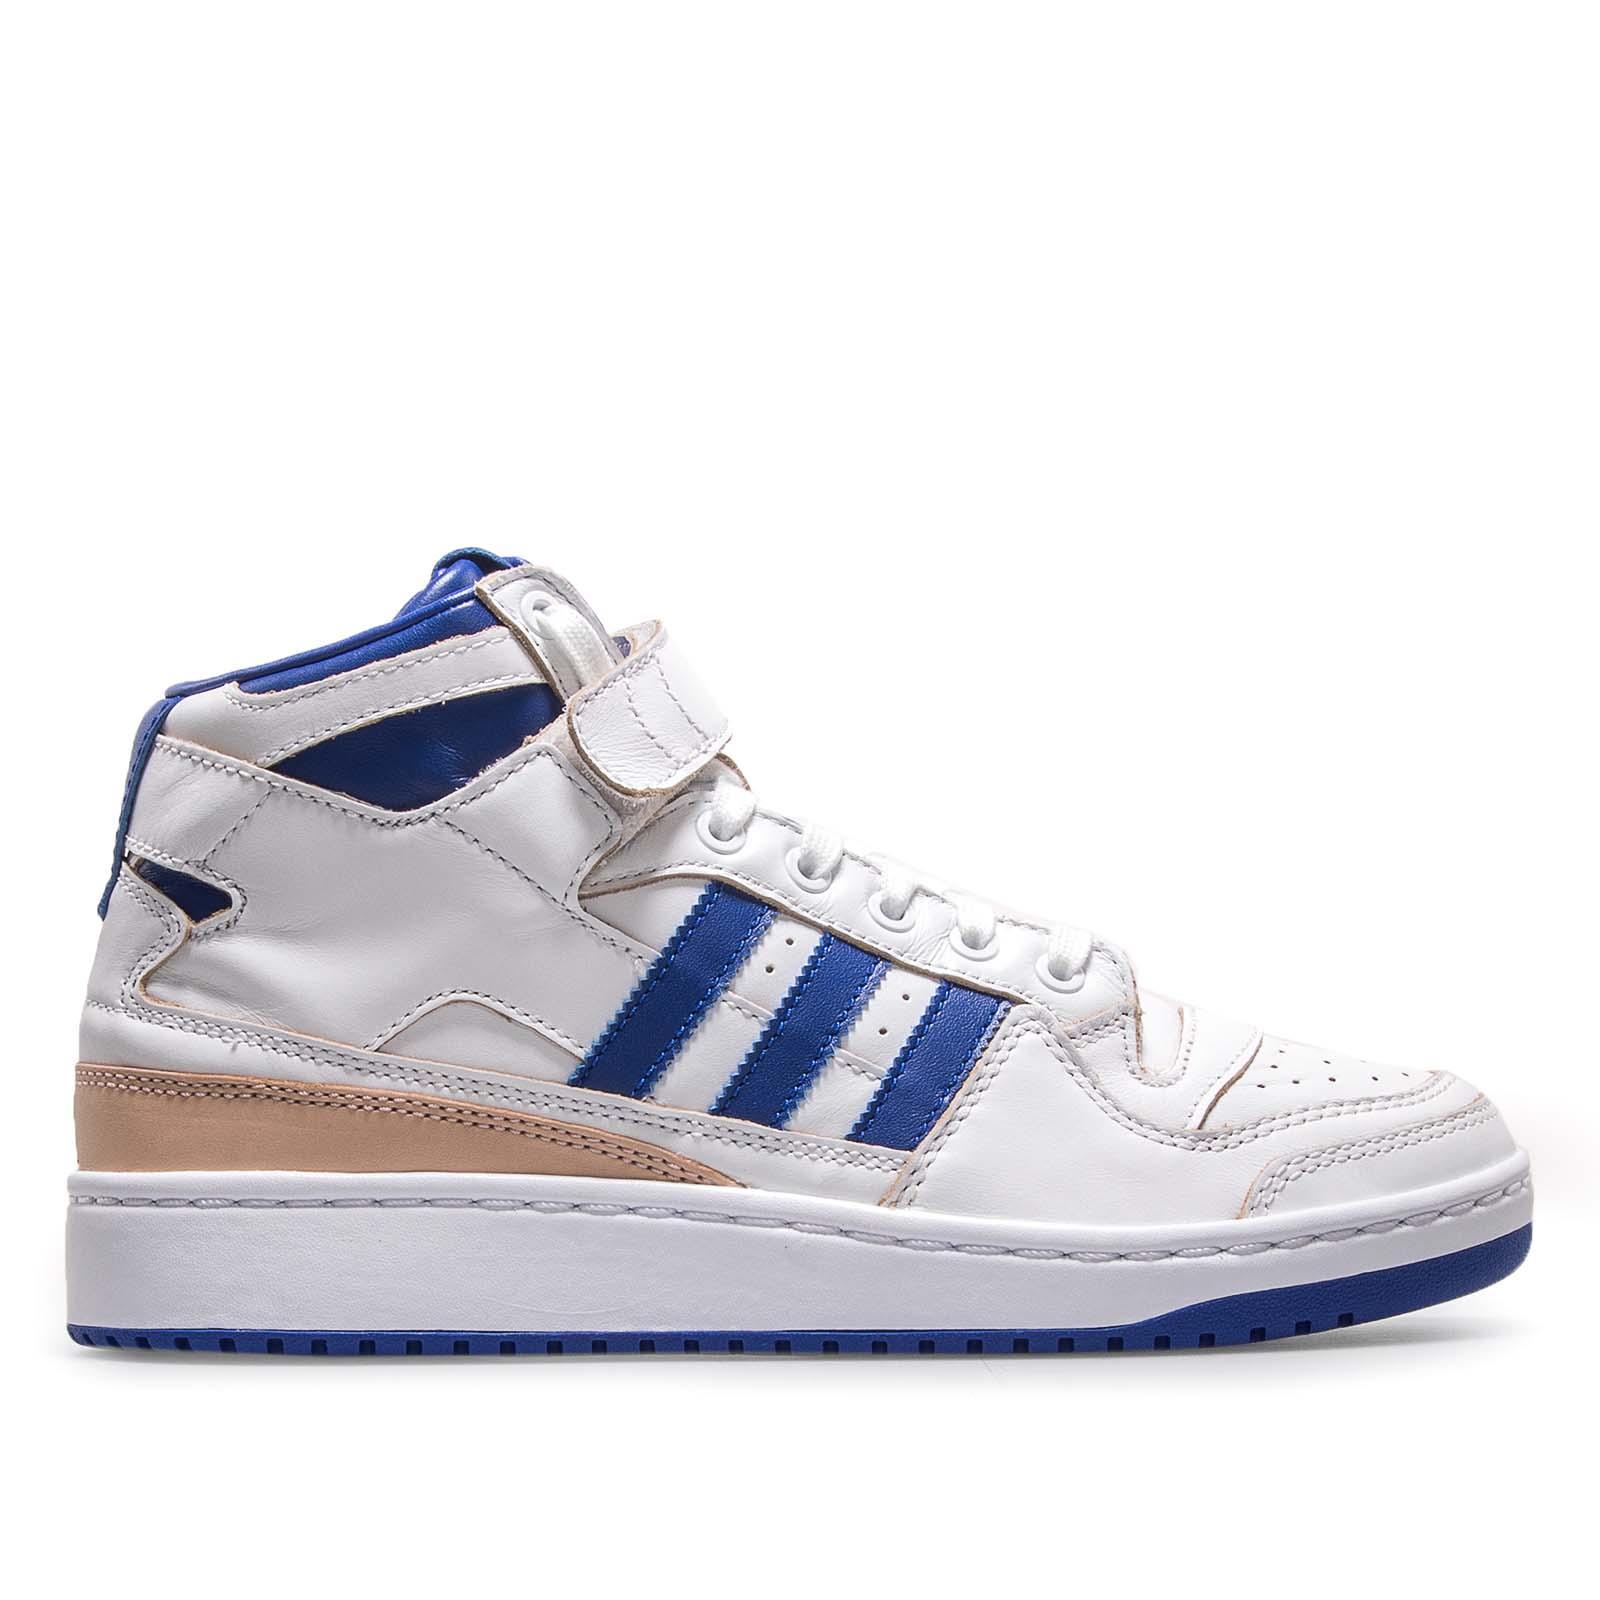 the latest c6715 bb74f where to buy adidas forum mid blau turnschuhe d2344 91aa3